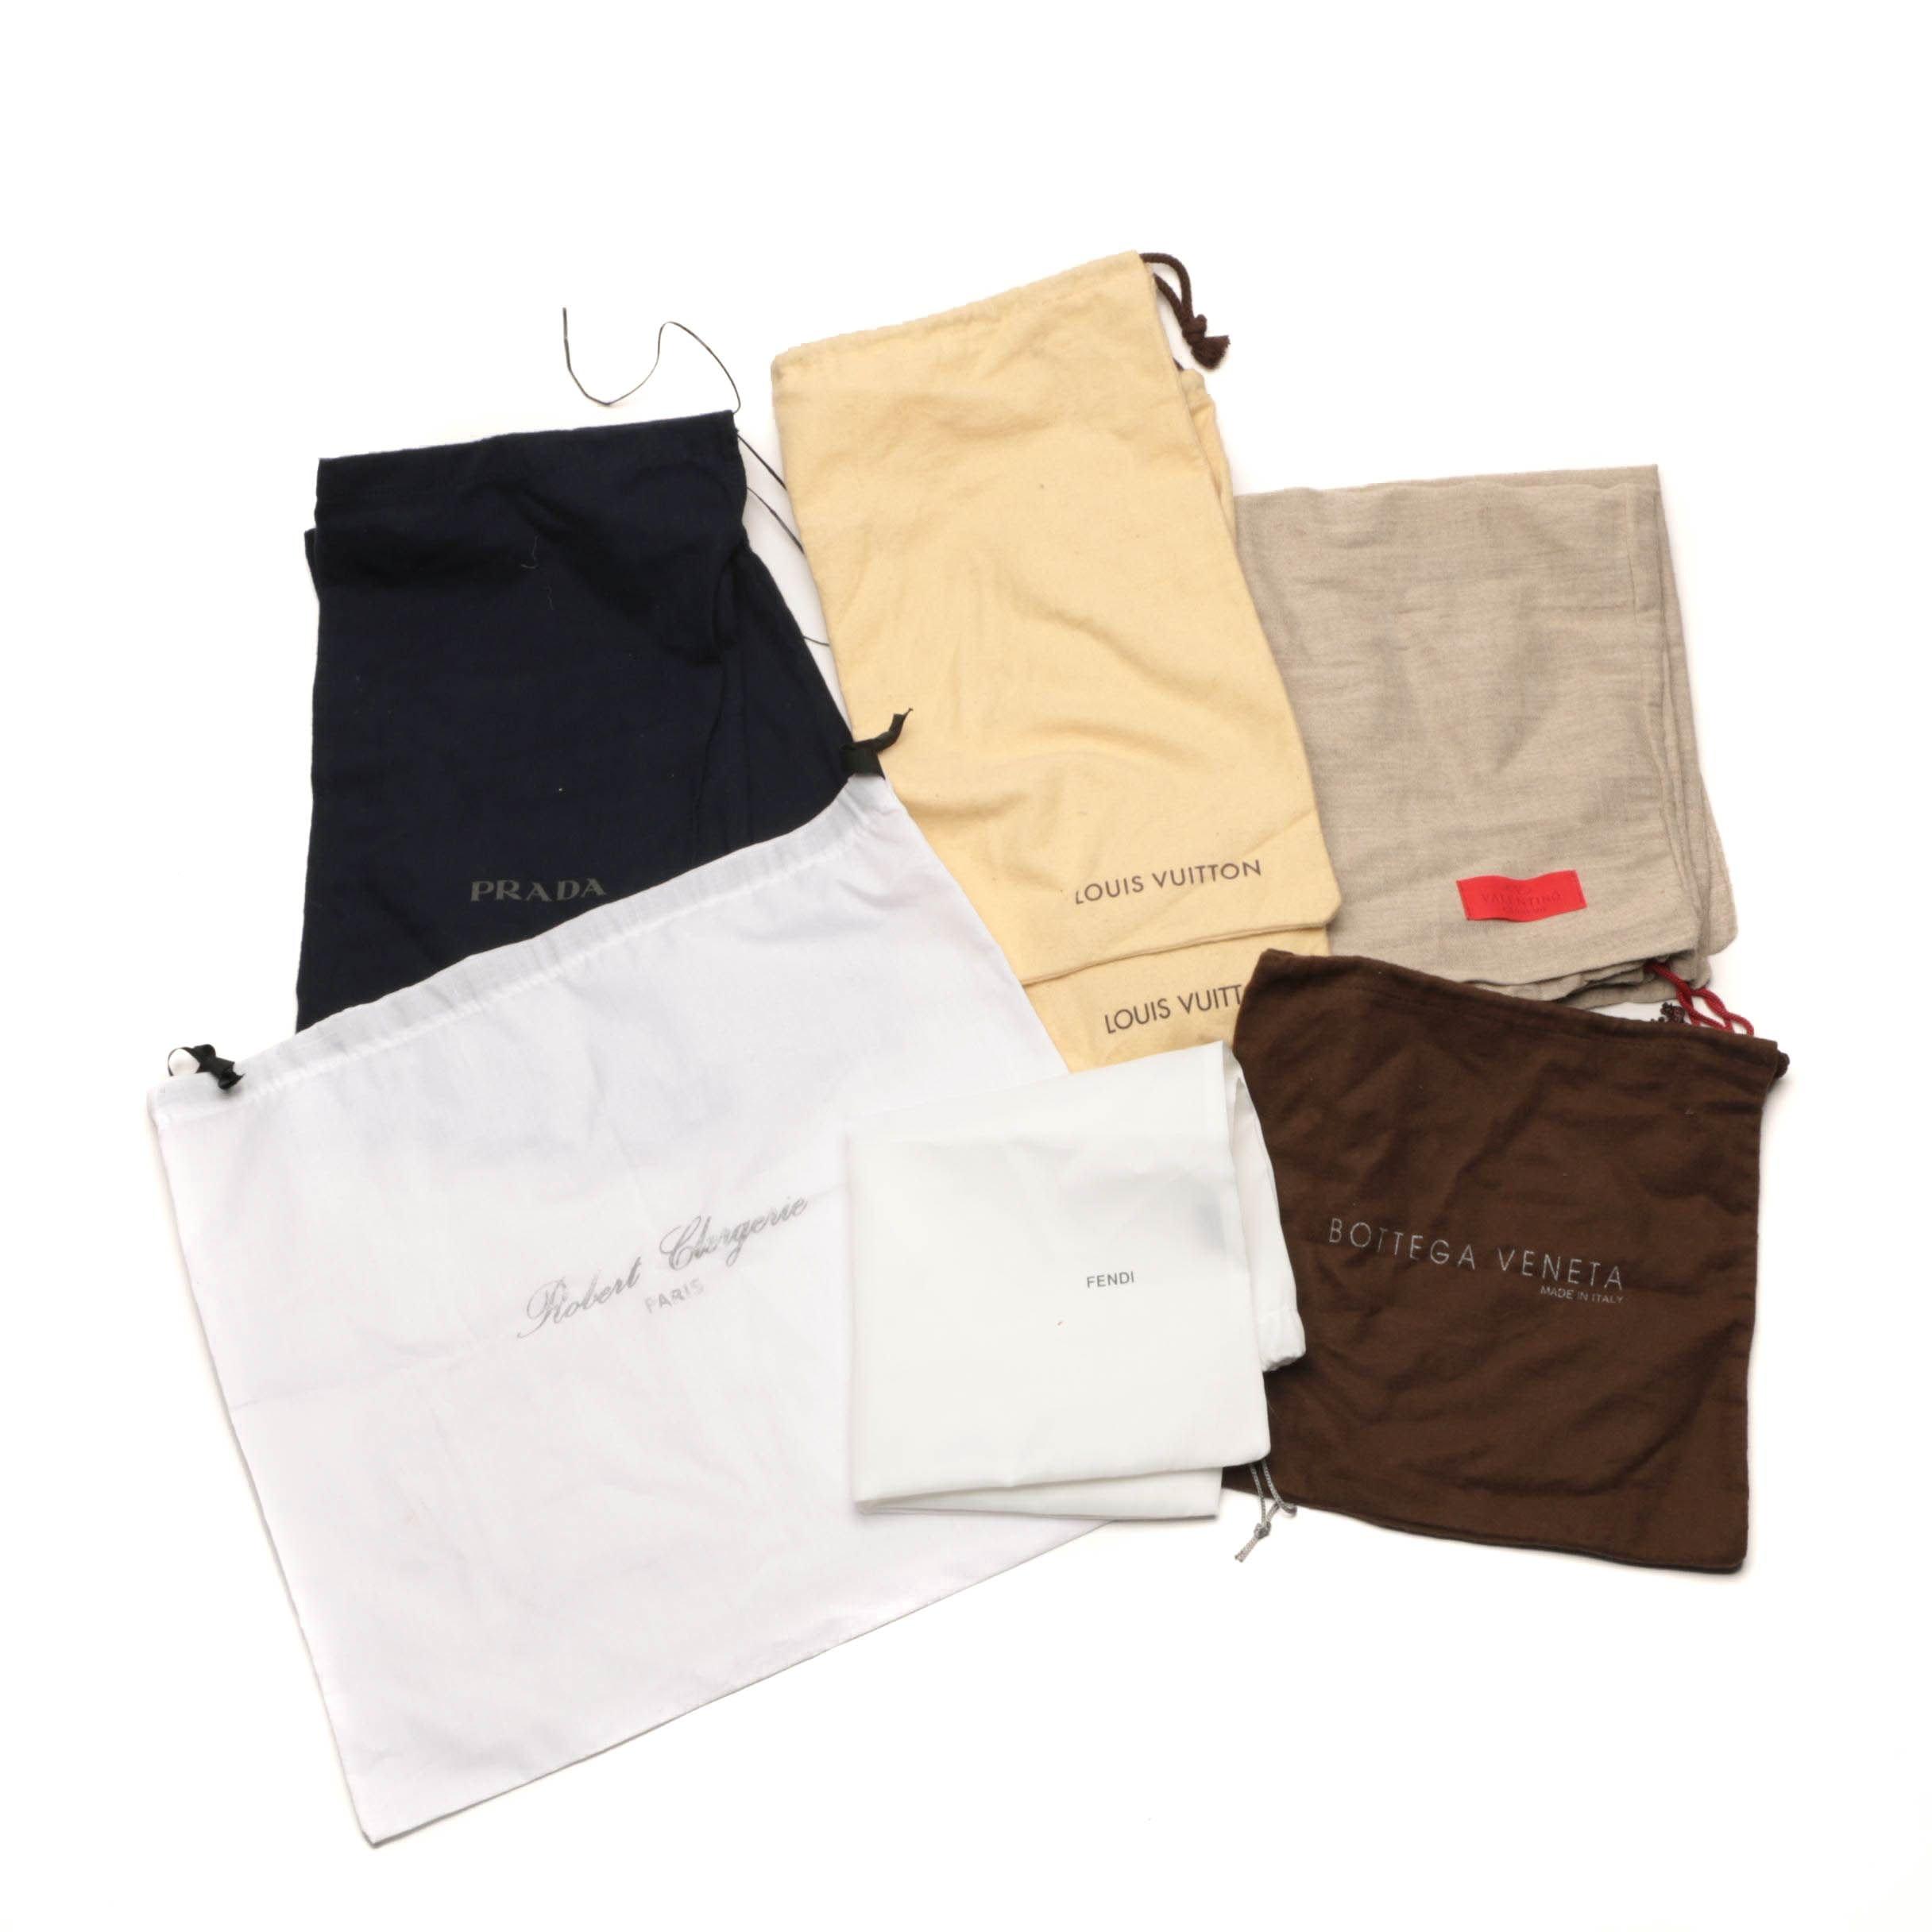 Designer Dust Bags Including Louis Vuitton and Prada